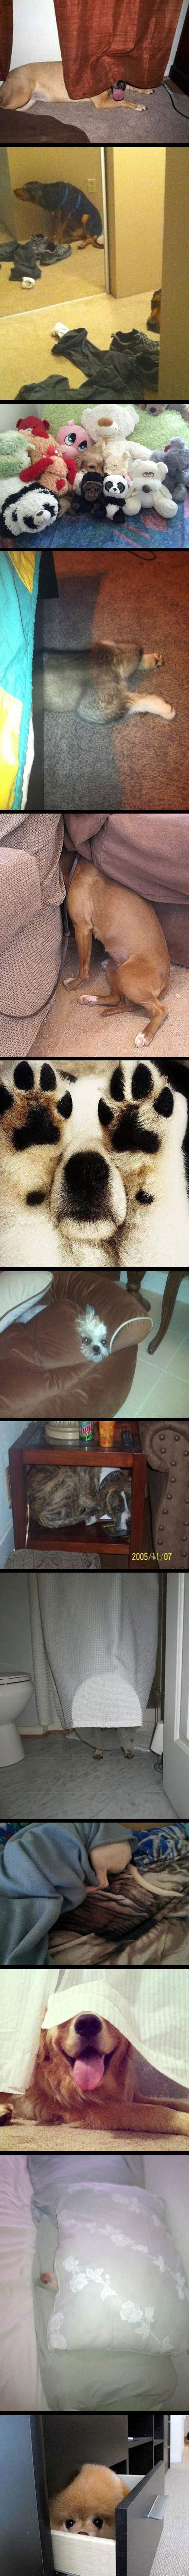 funny-dogs-hiding-seek-bad-stink